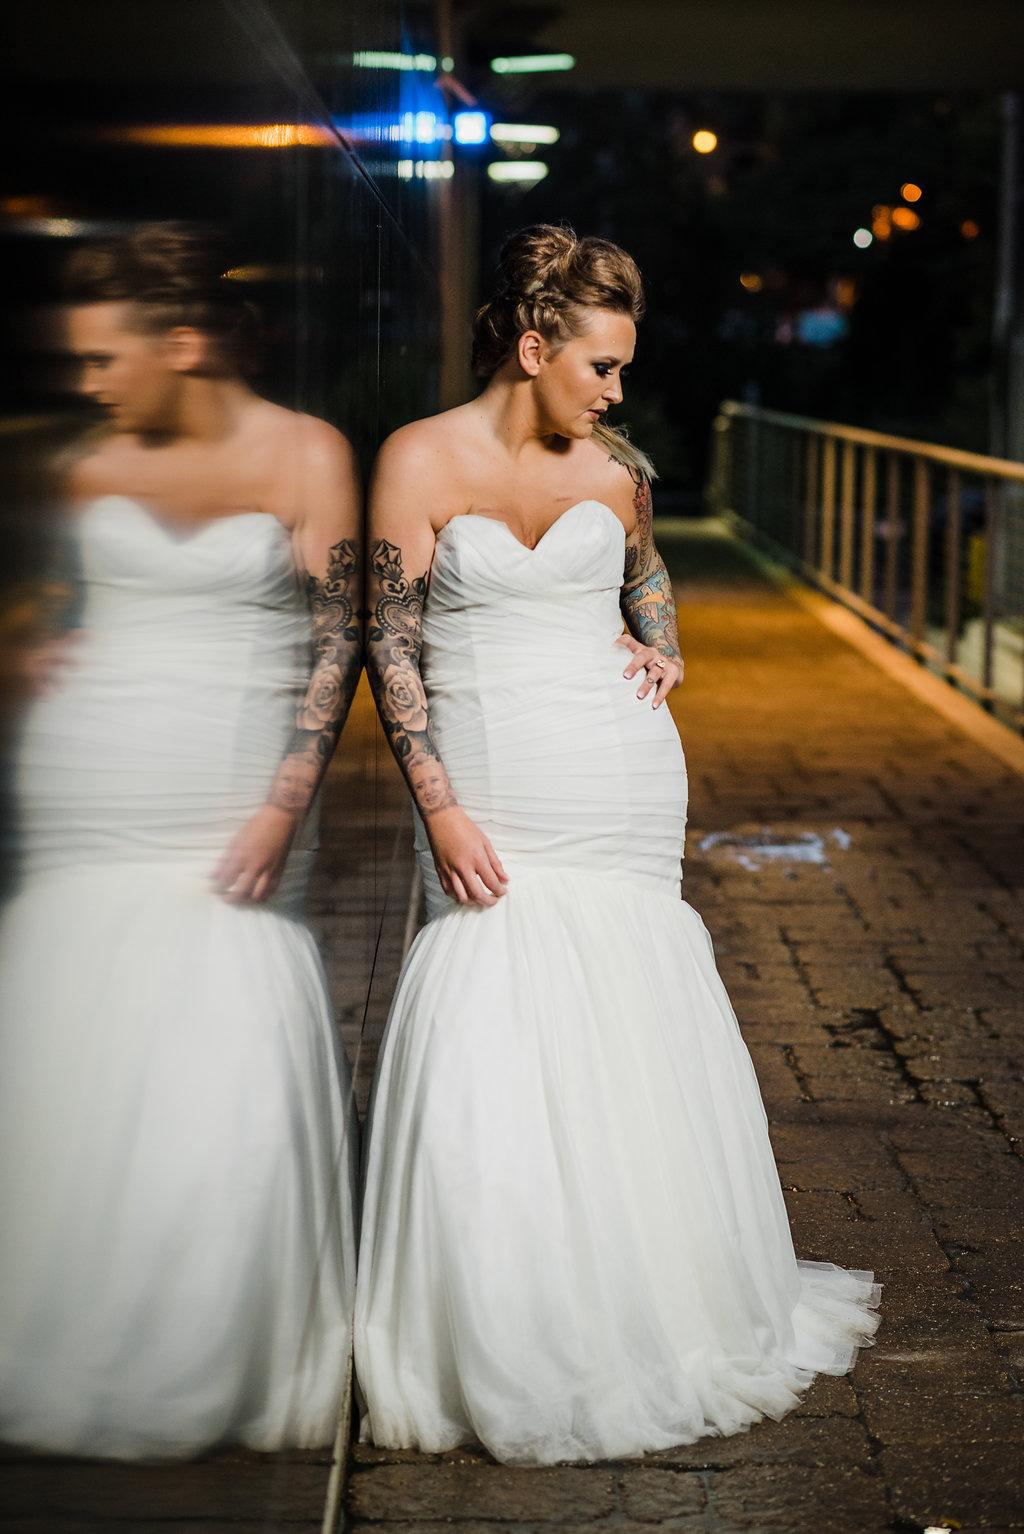 Milwaukee-Wisconsin-Wedding-Photographer-Black-Cat-Alley-Styled-Bridal-Shoot-89.jpg